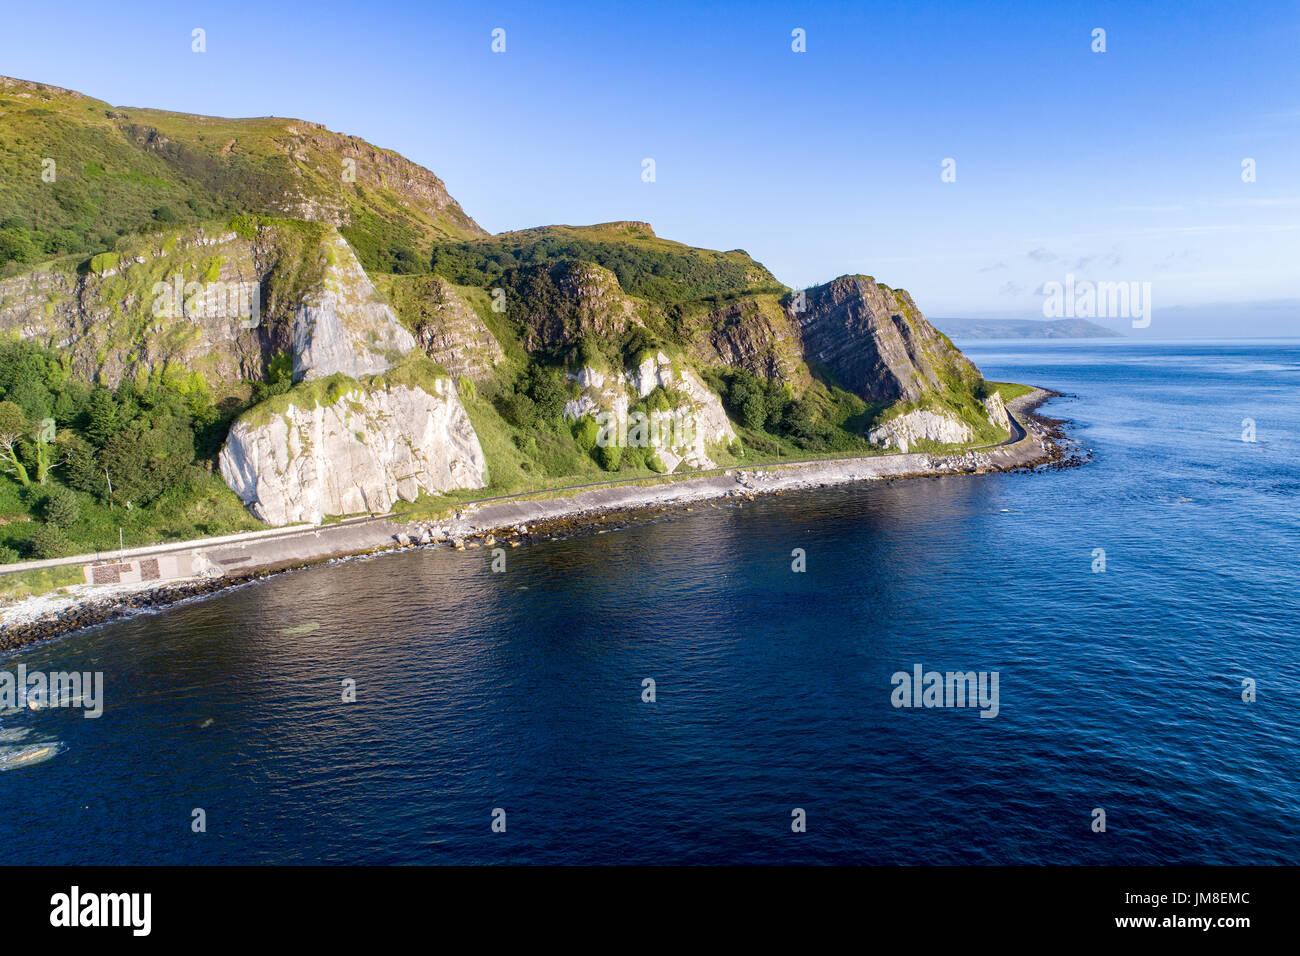 Scenic Coastal Route Stock Photos & Scenic Coastal Route ...